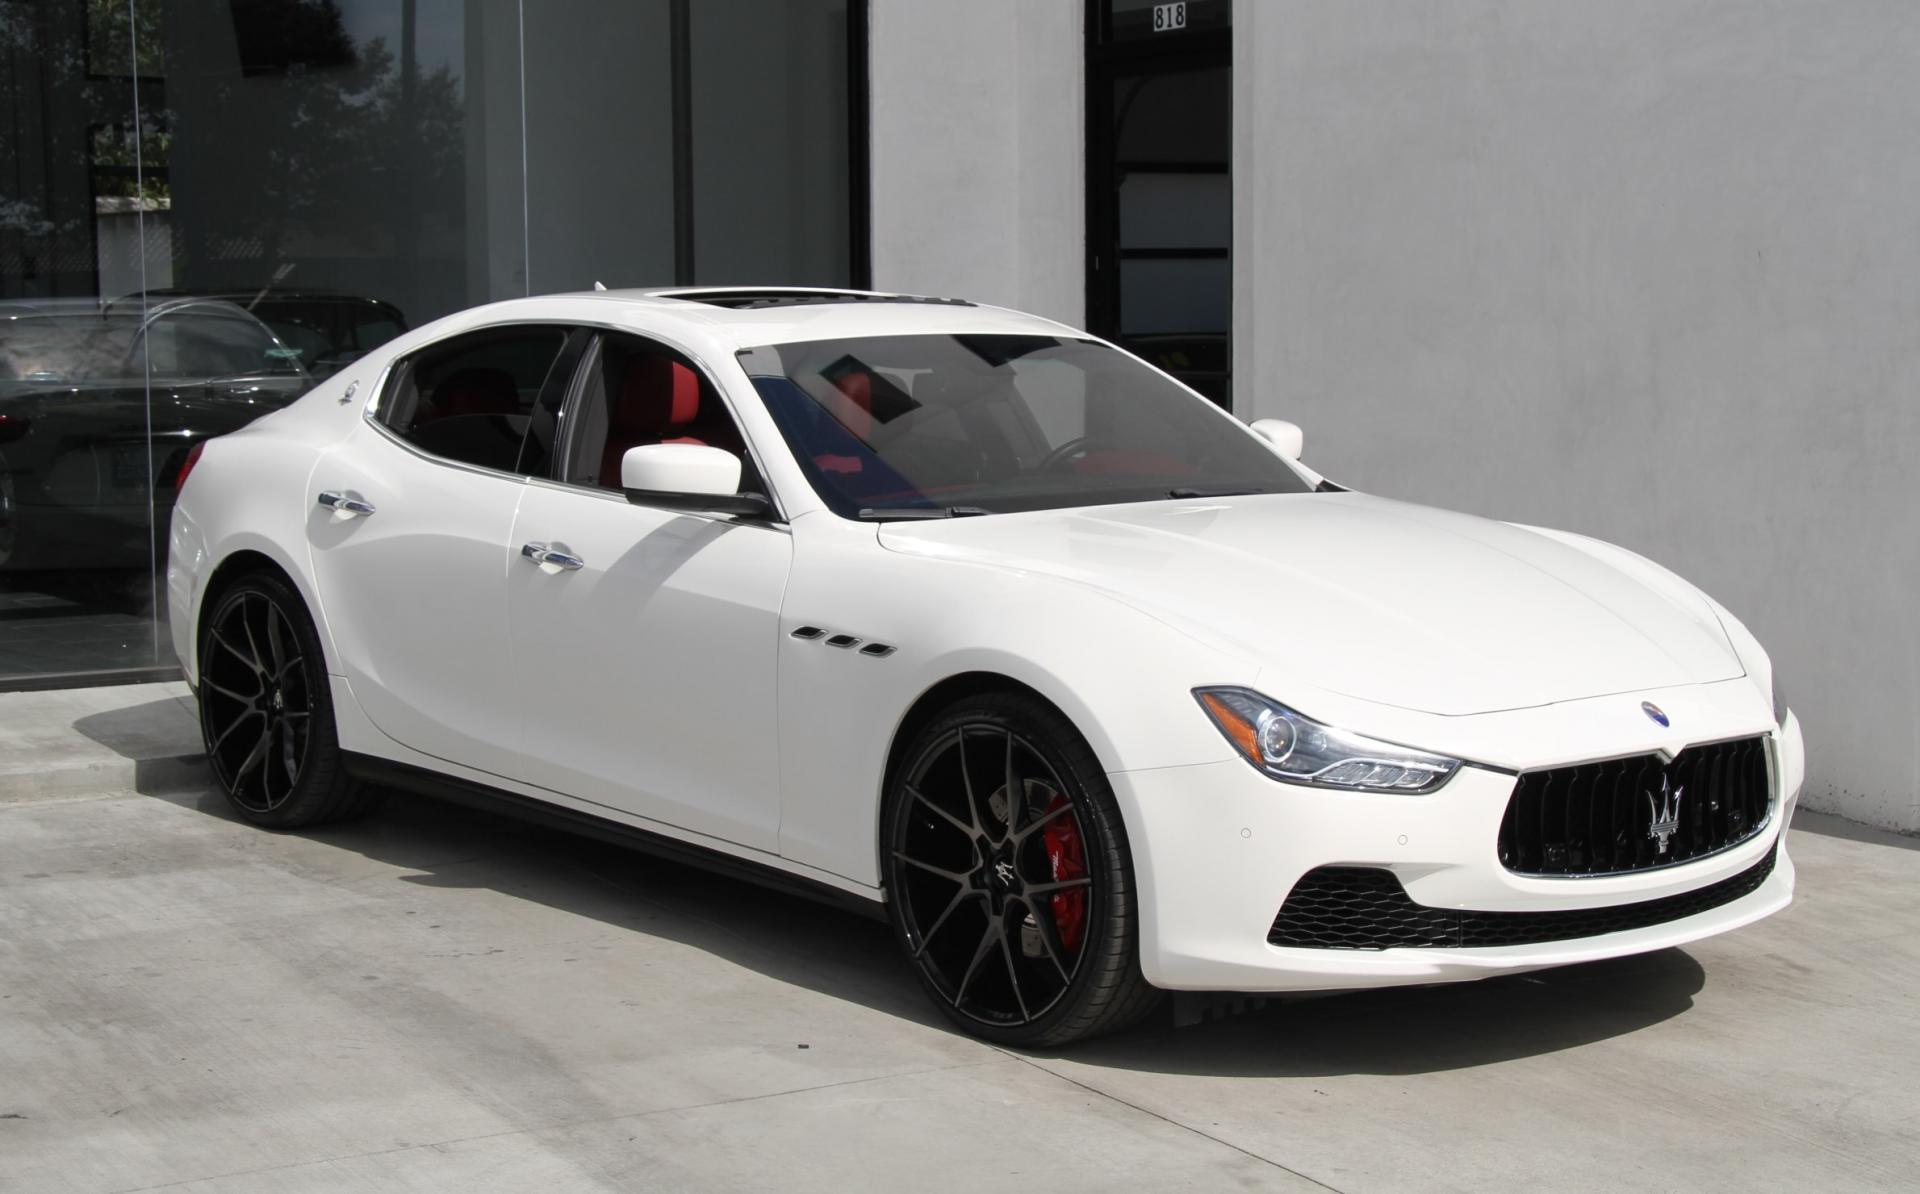 2016 Maserati Ghibli S Stock  5994 for sale near Redondo Beach CA  CA Maserati Dealer